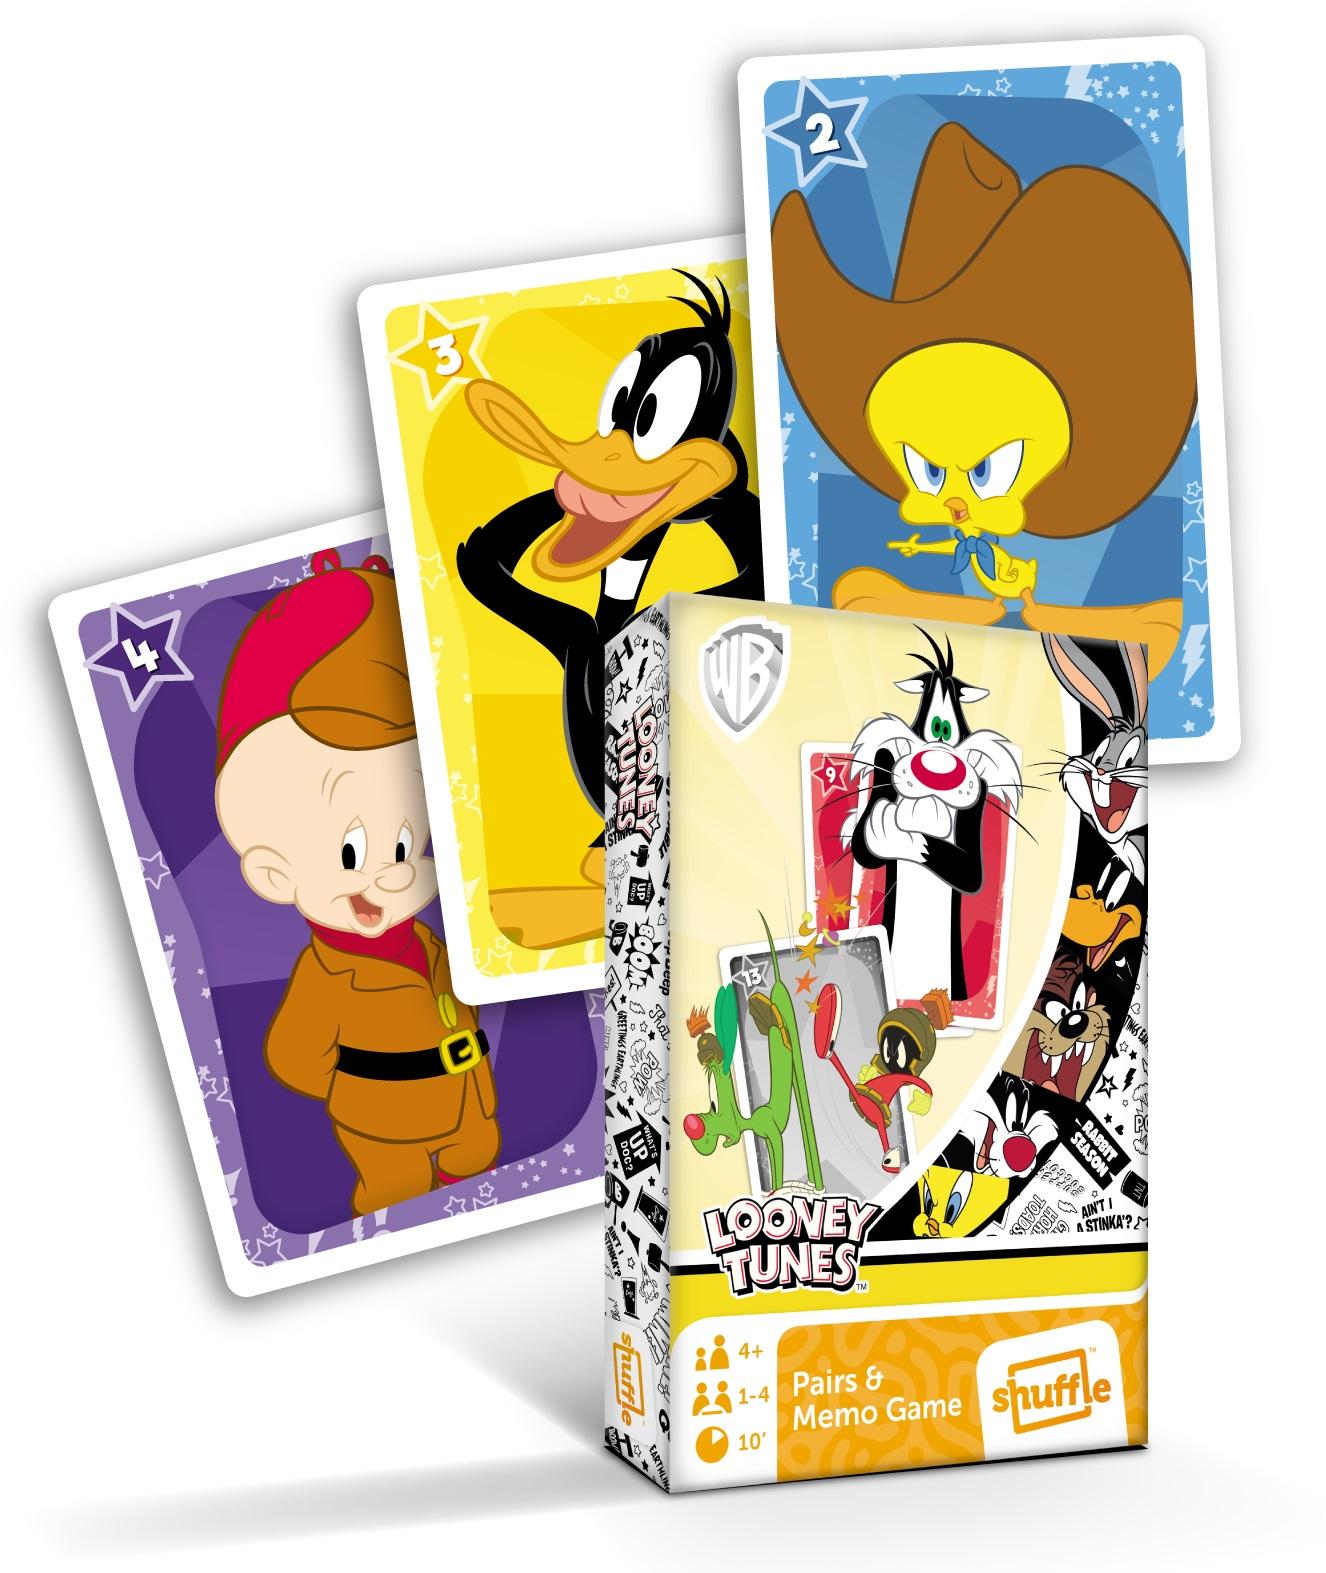 Karty Černý Petr Looney Tunes